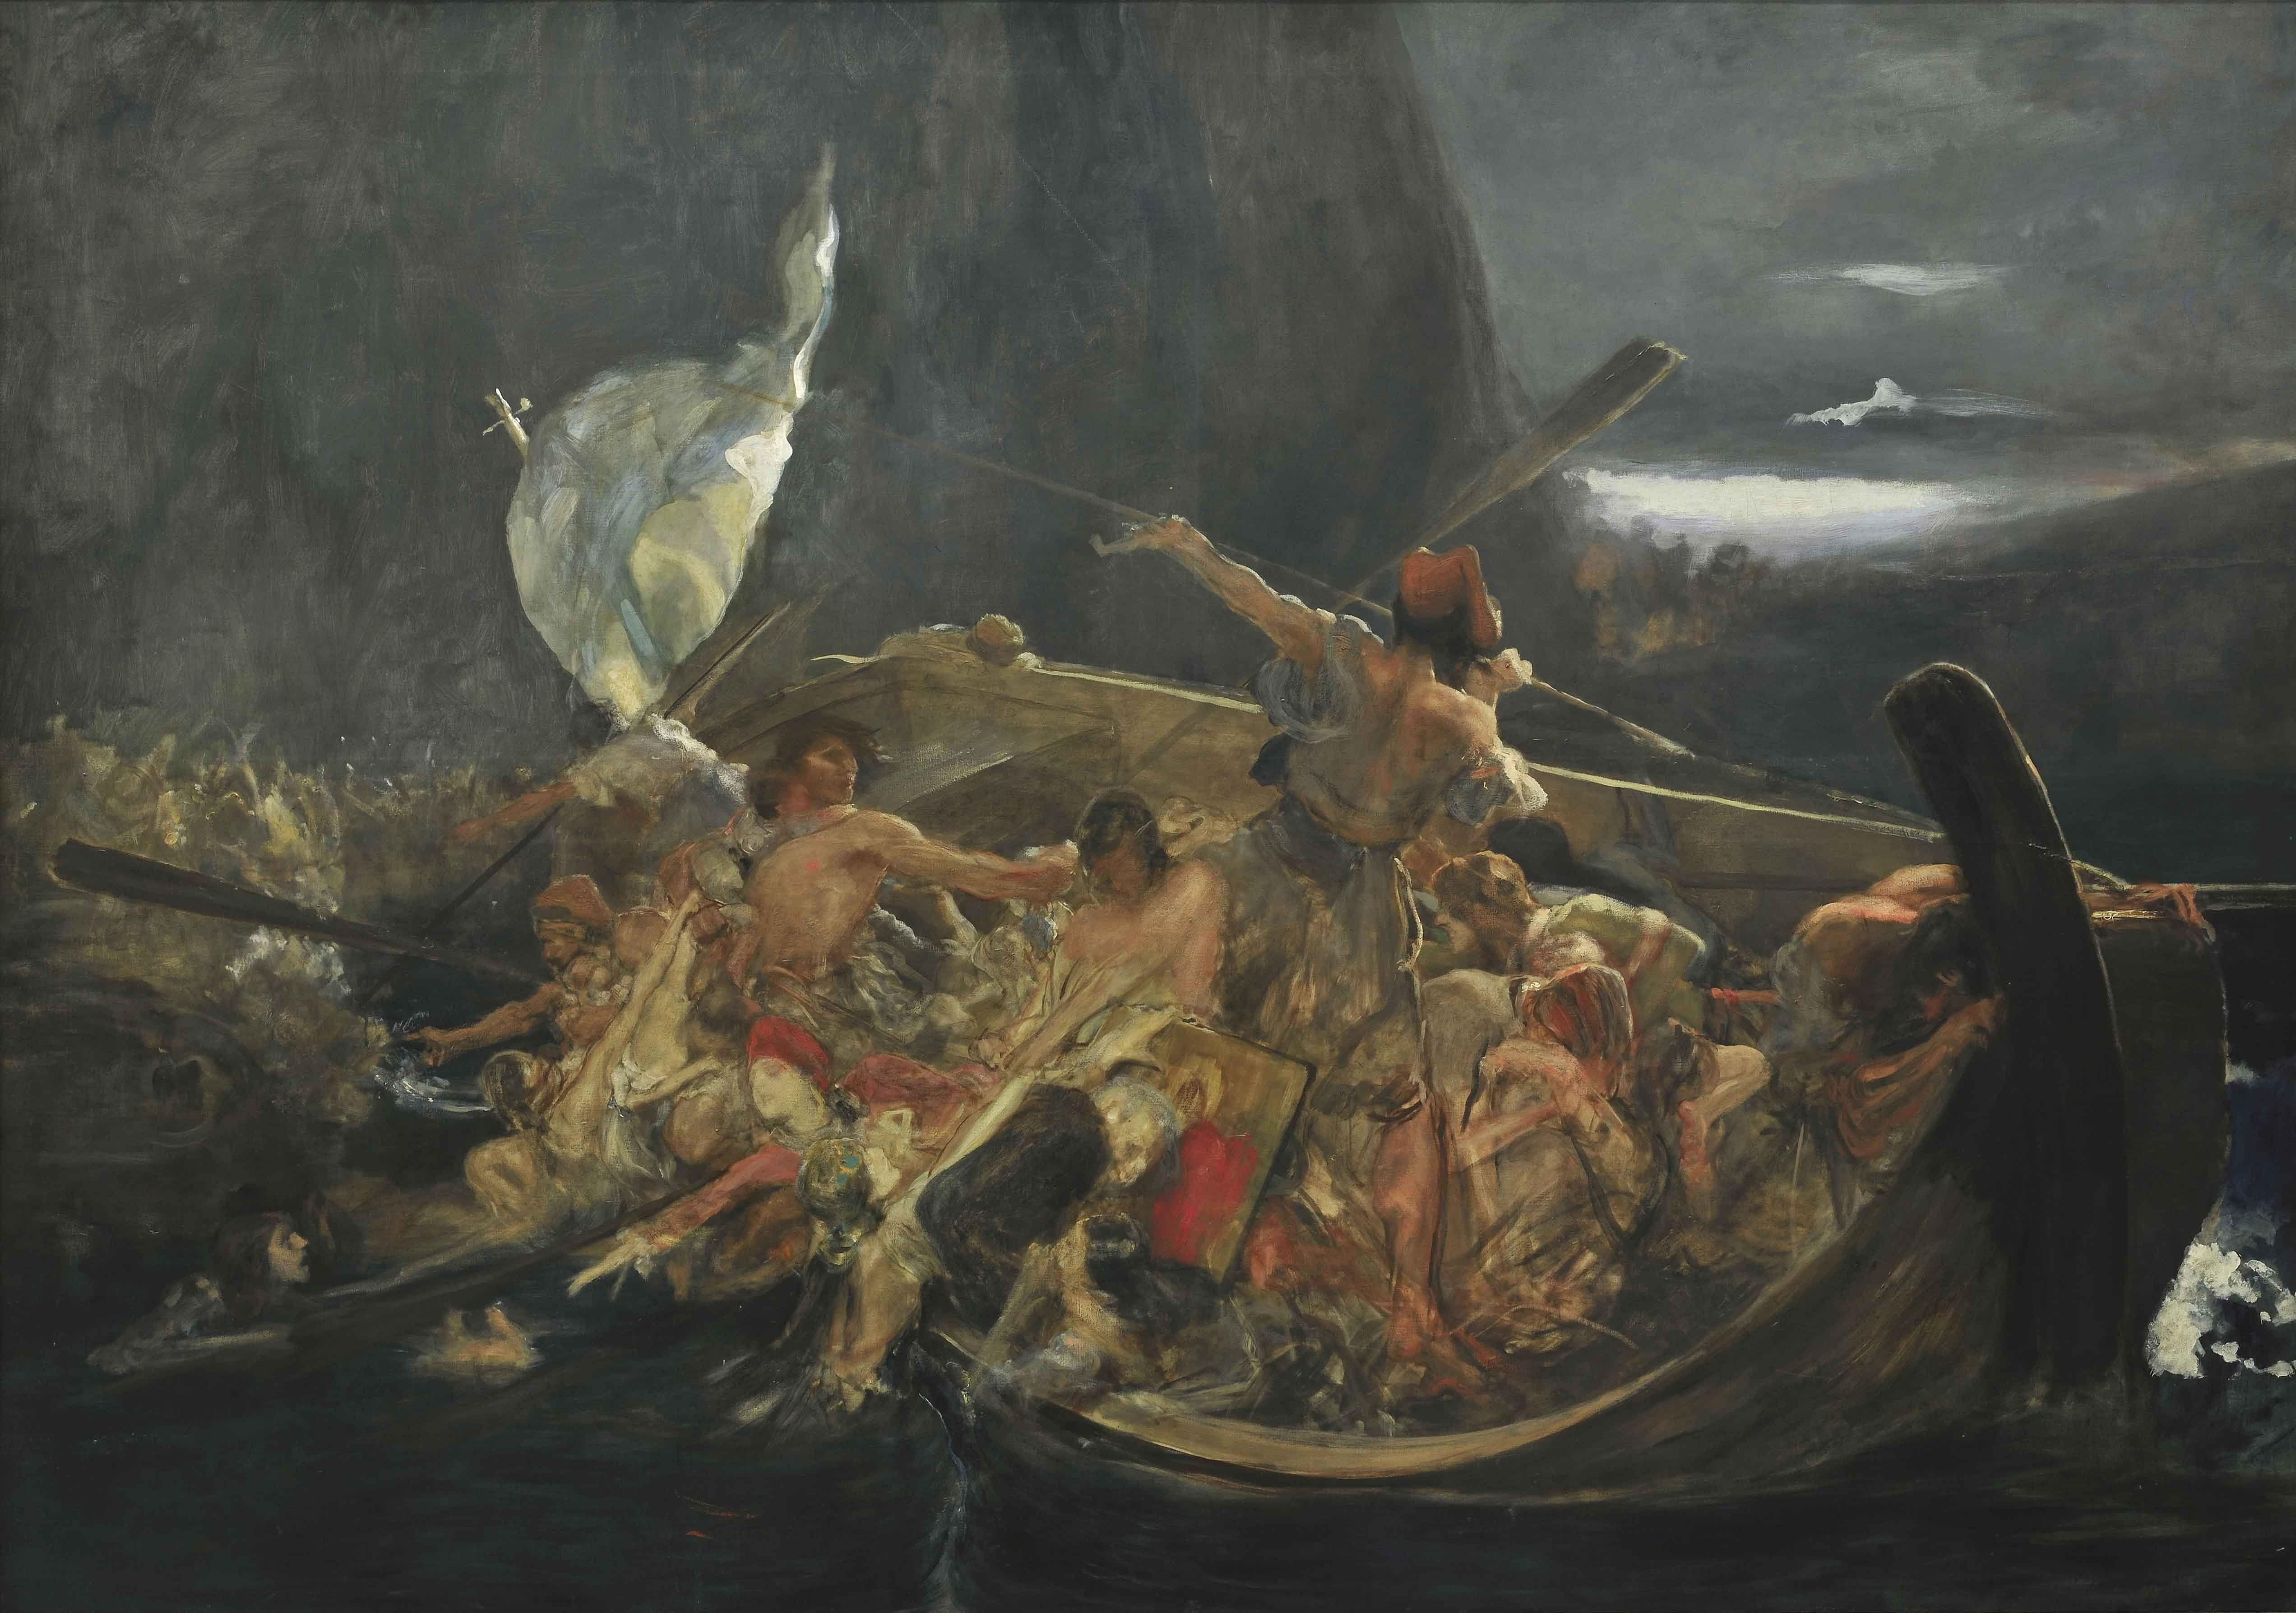 Pintura e escultura do mundo - Página 2 Gysis_Nikolaos_After_the_destruction_of_Psara